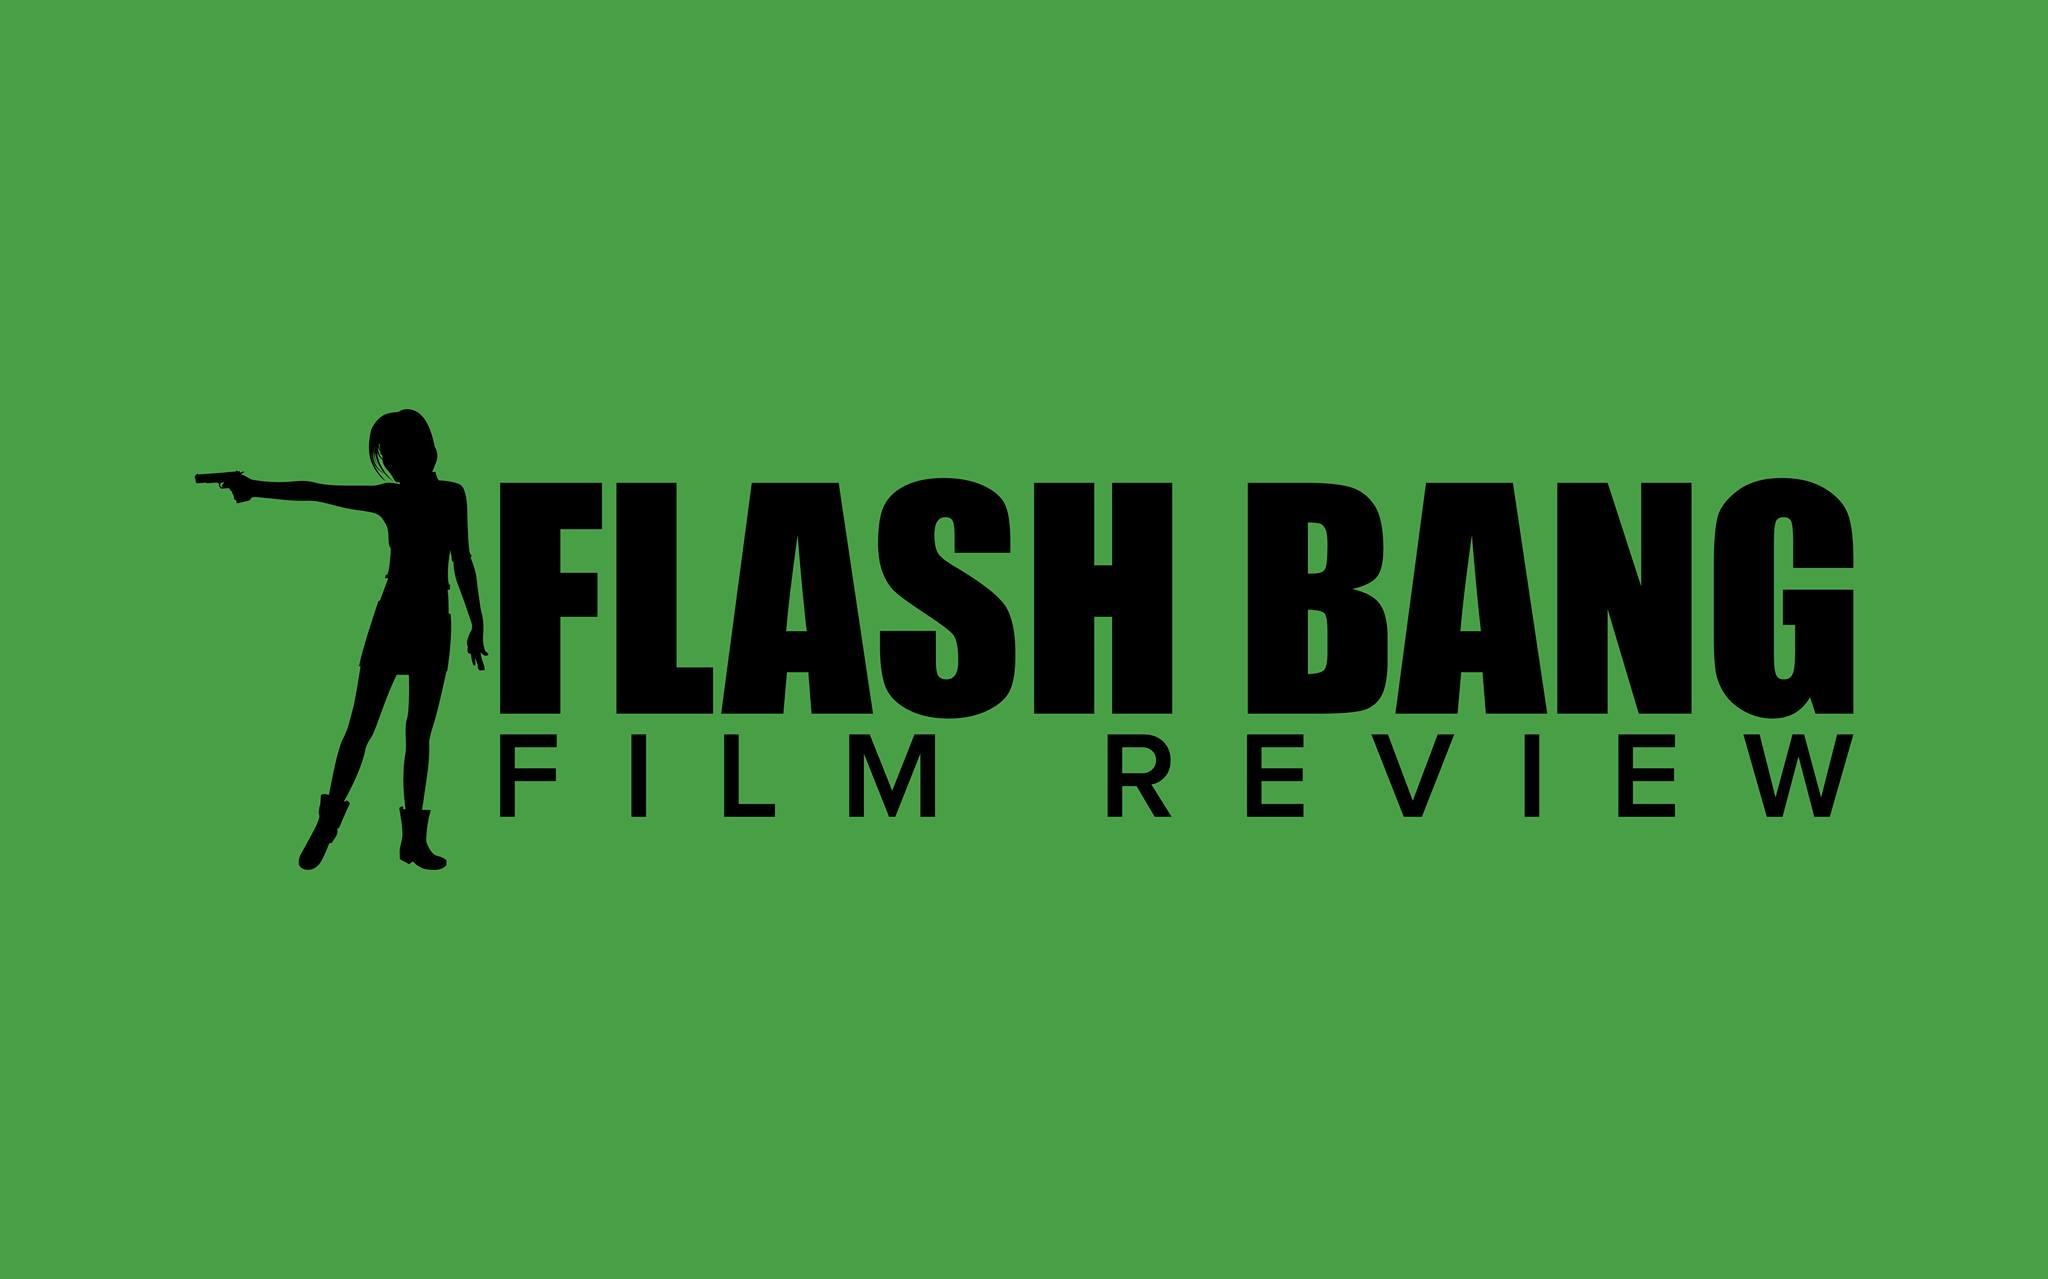 flash bang.jpg